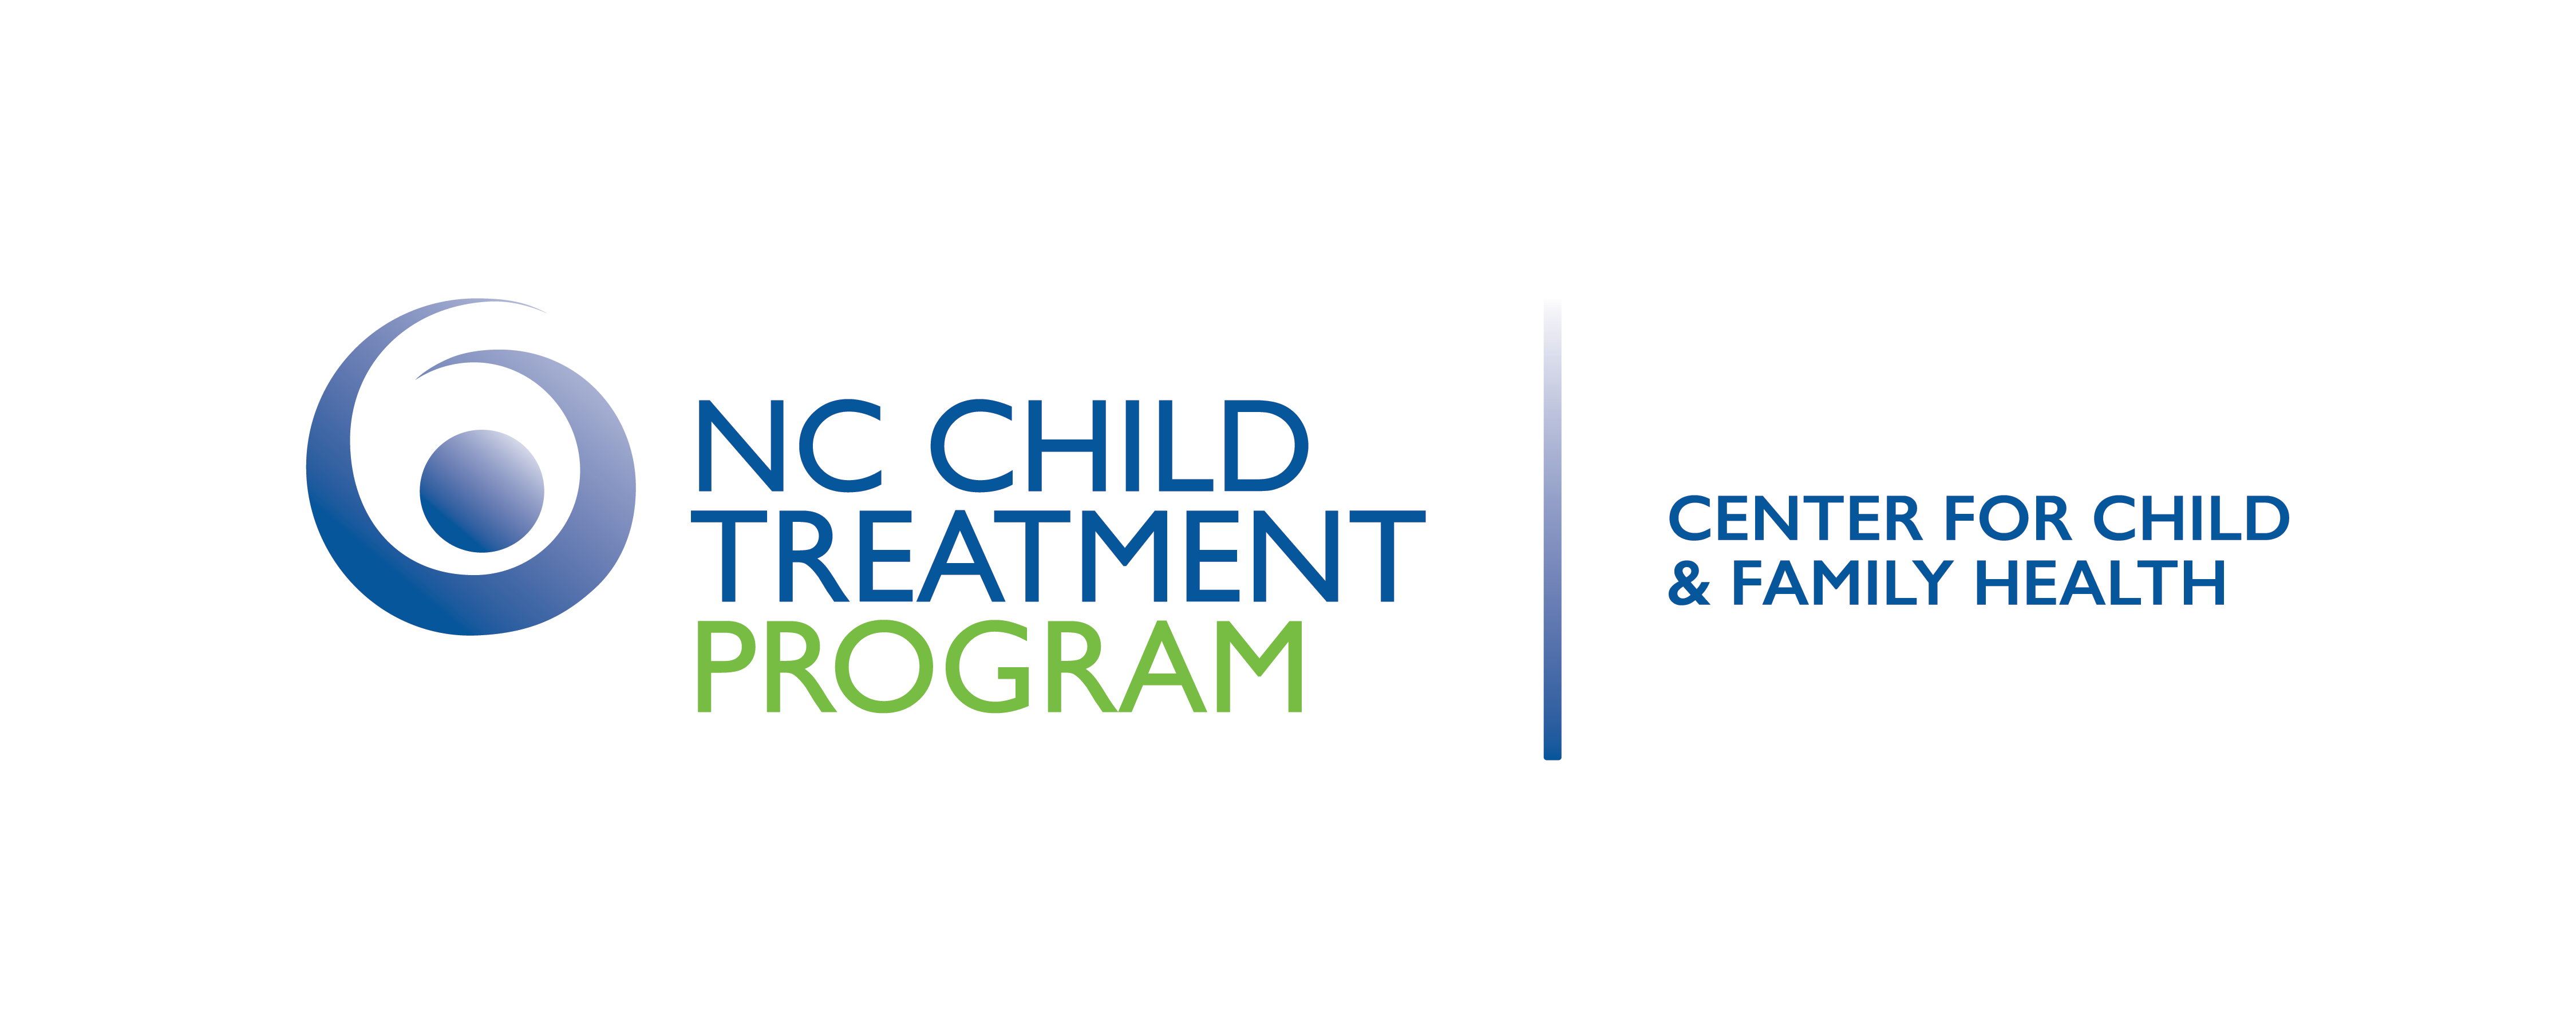 North Carolina Child Treatment Program